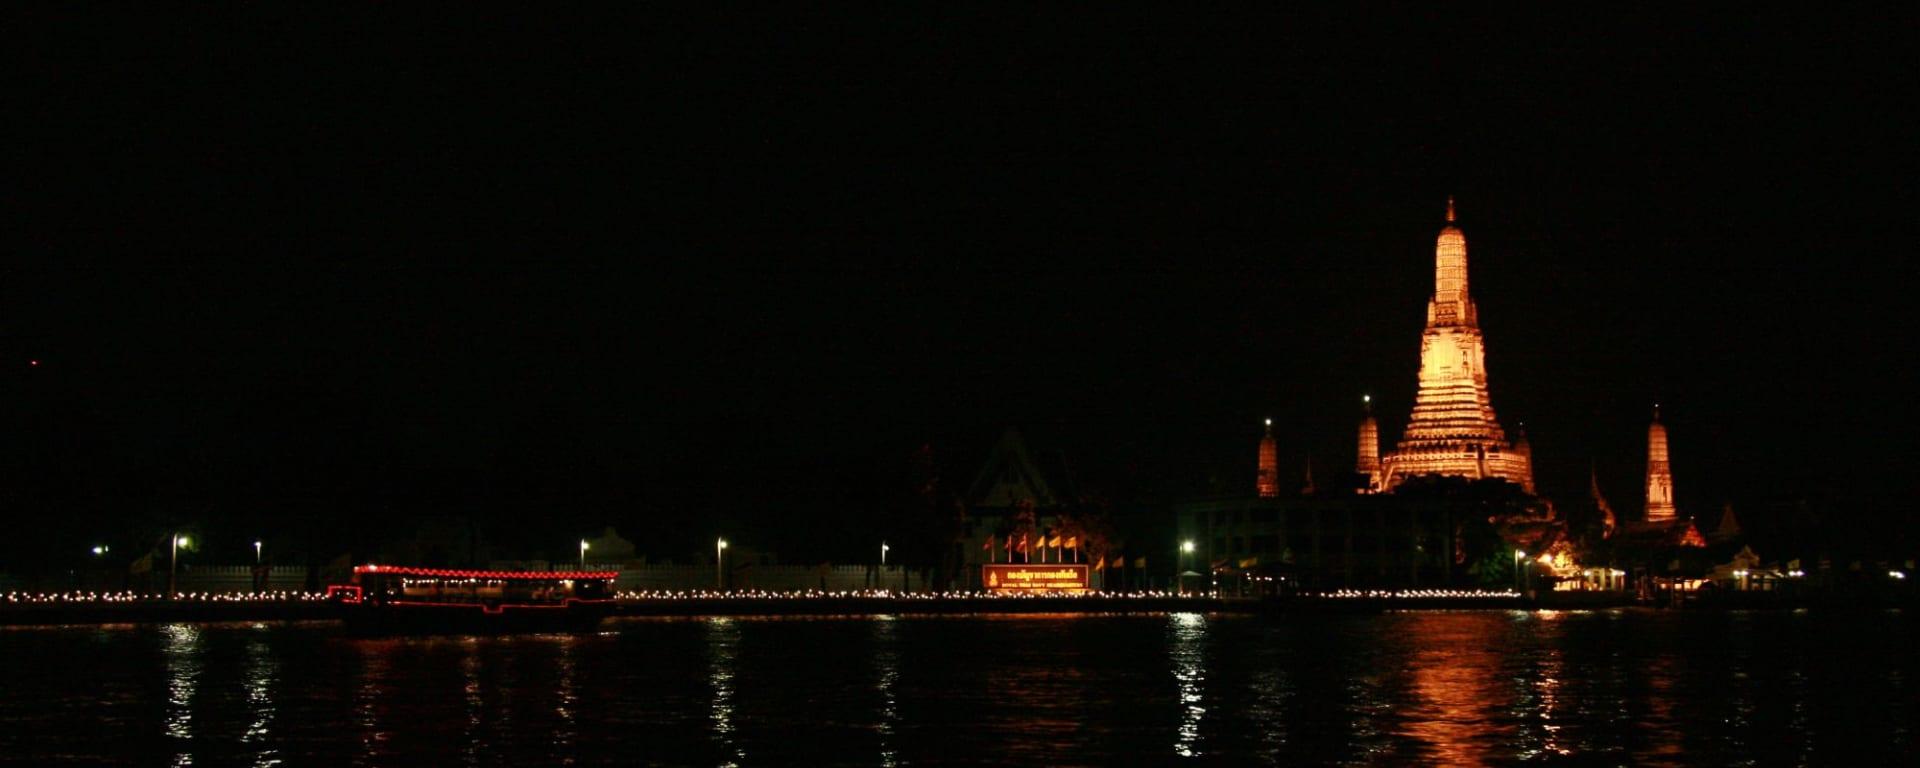 Chao Phraya by Night à Bangkok: Bangkok